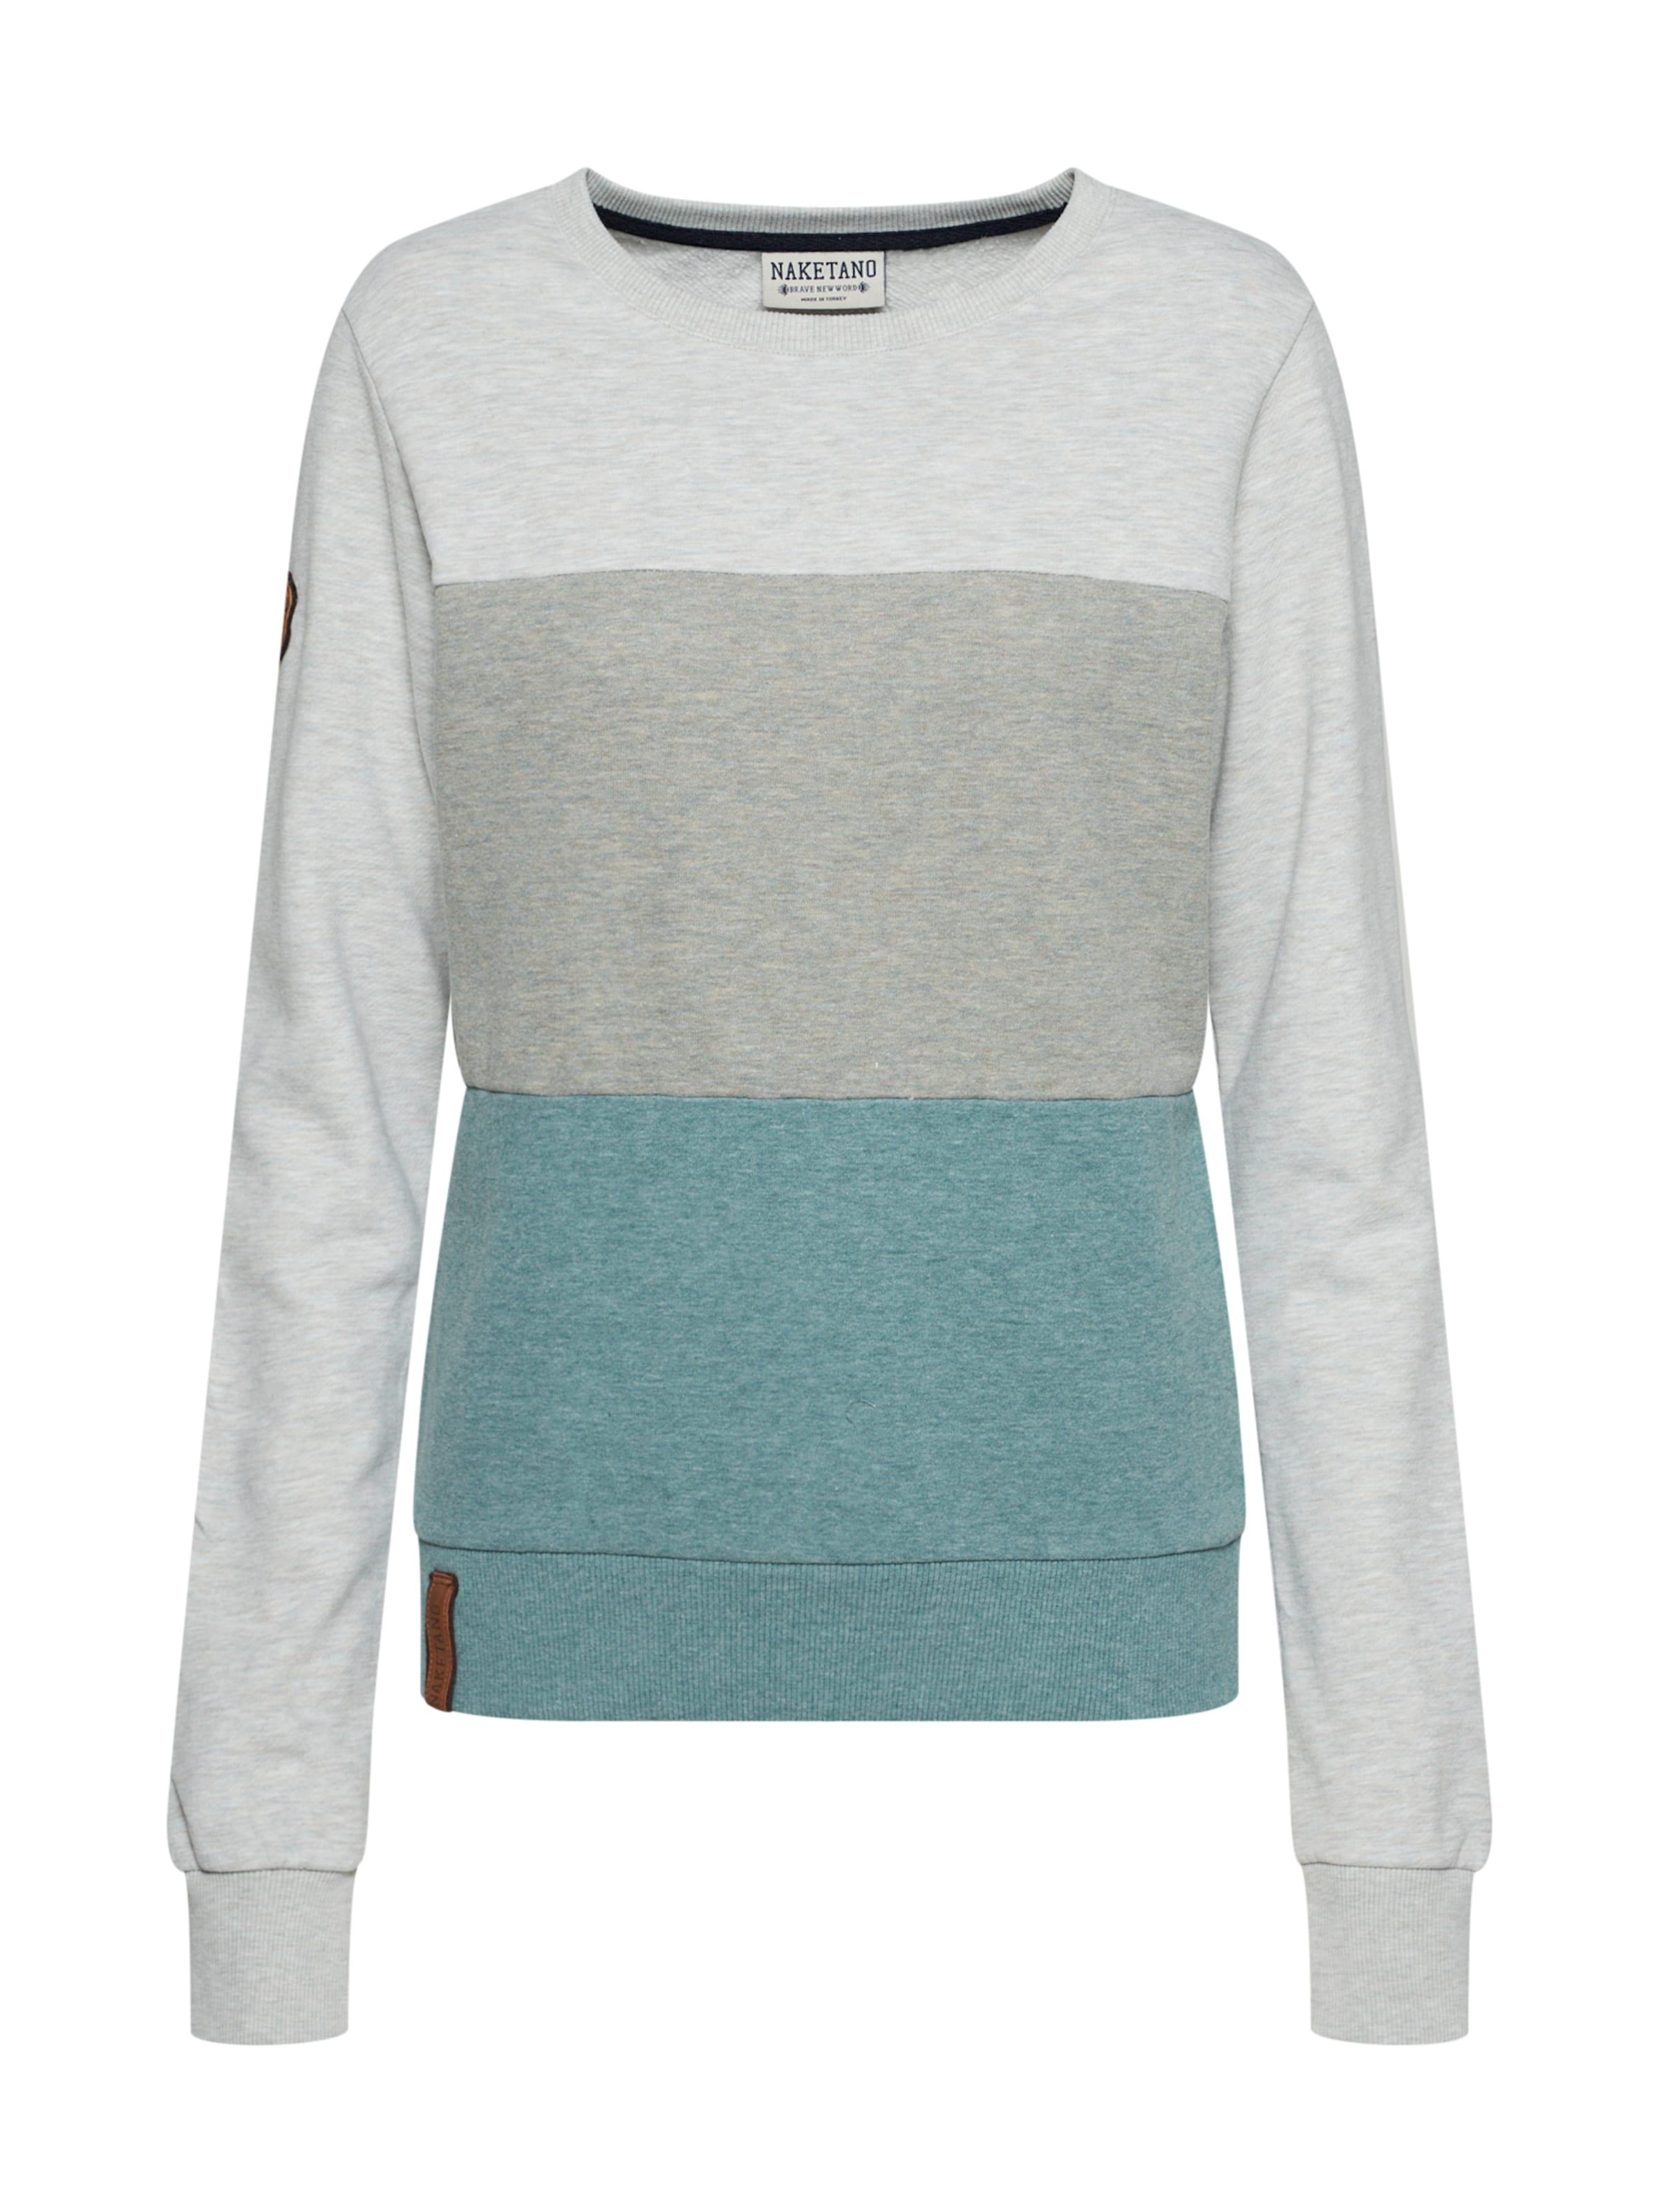 Naketano En shirt AquaBleu Vert 'arschfritöse' Sweat Pastel SqzMpLjUVG